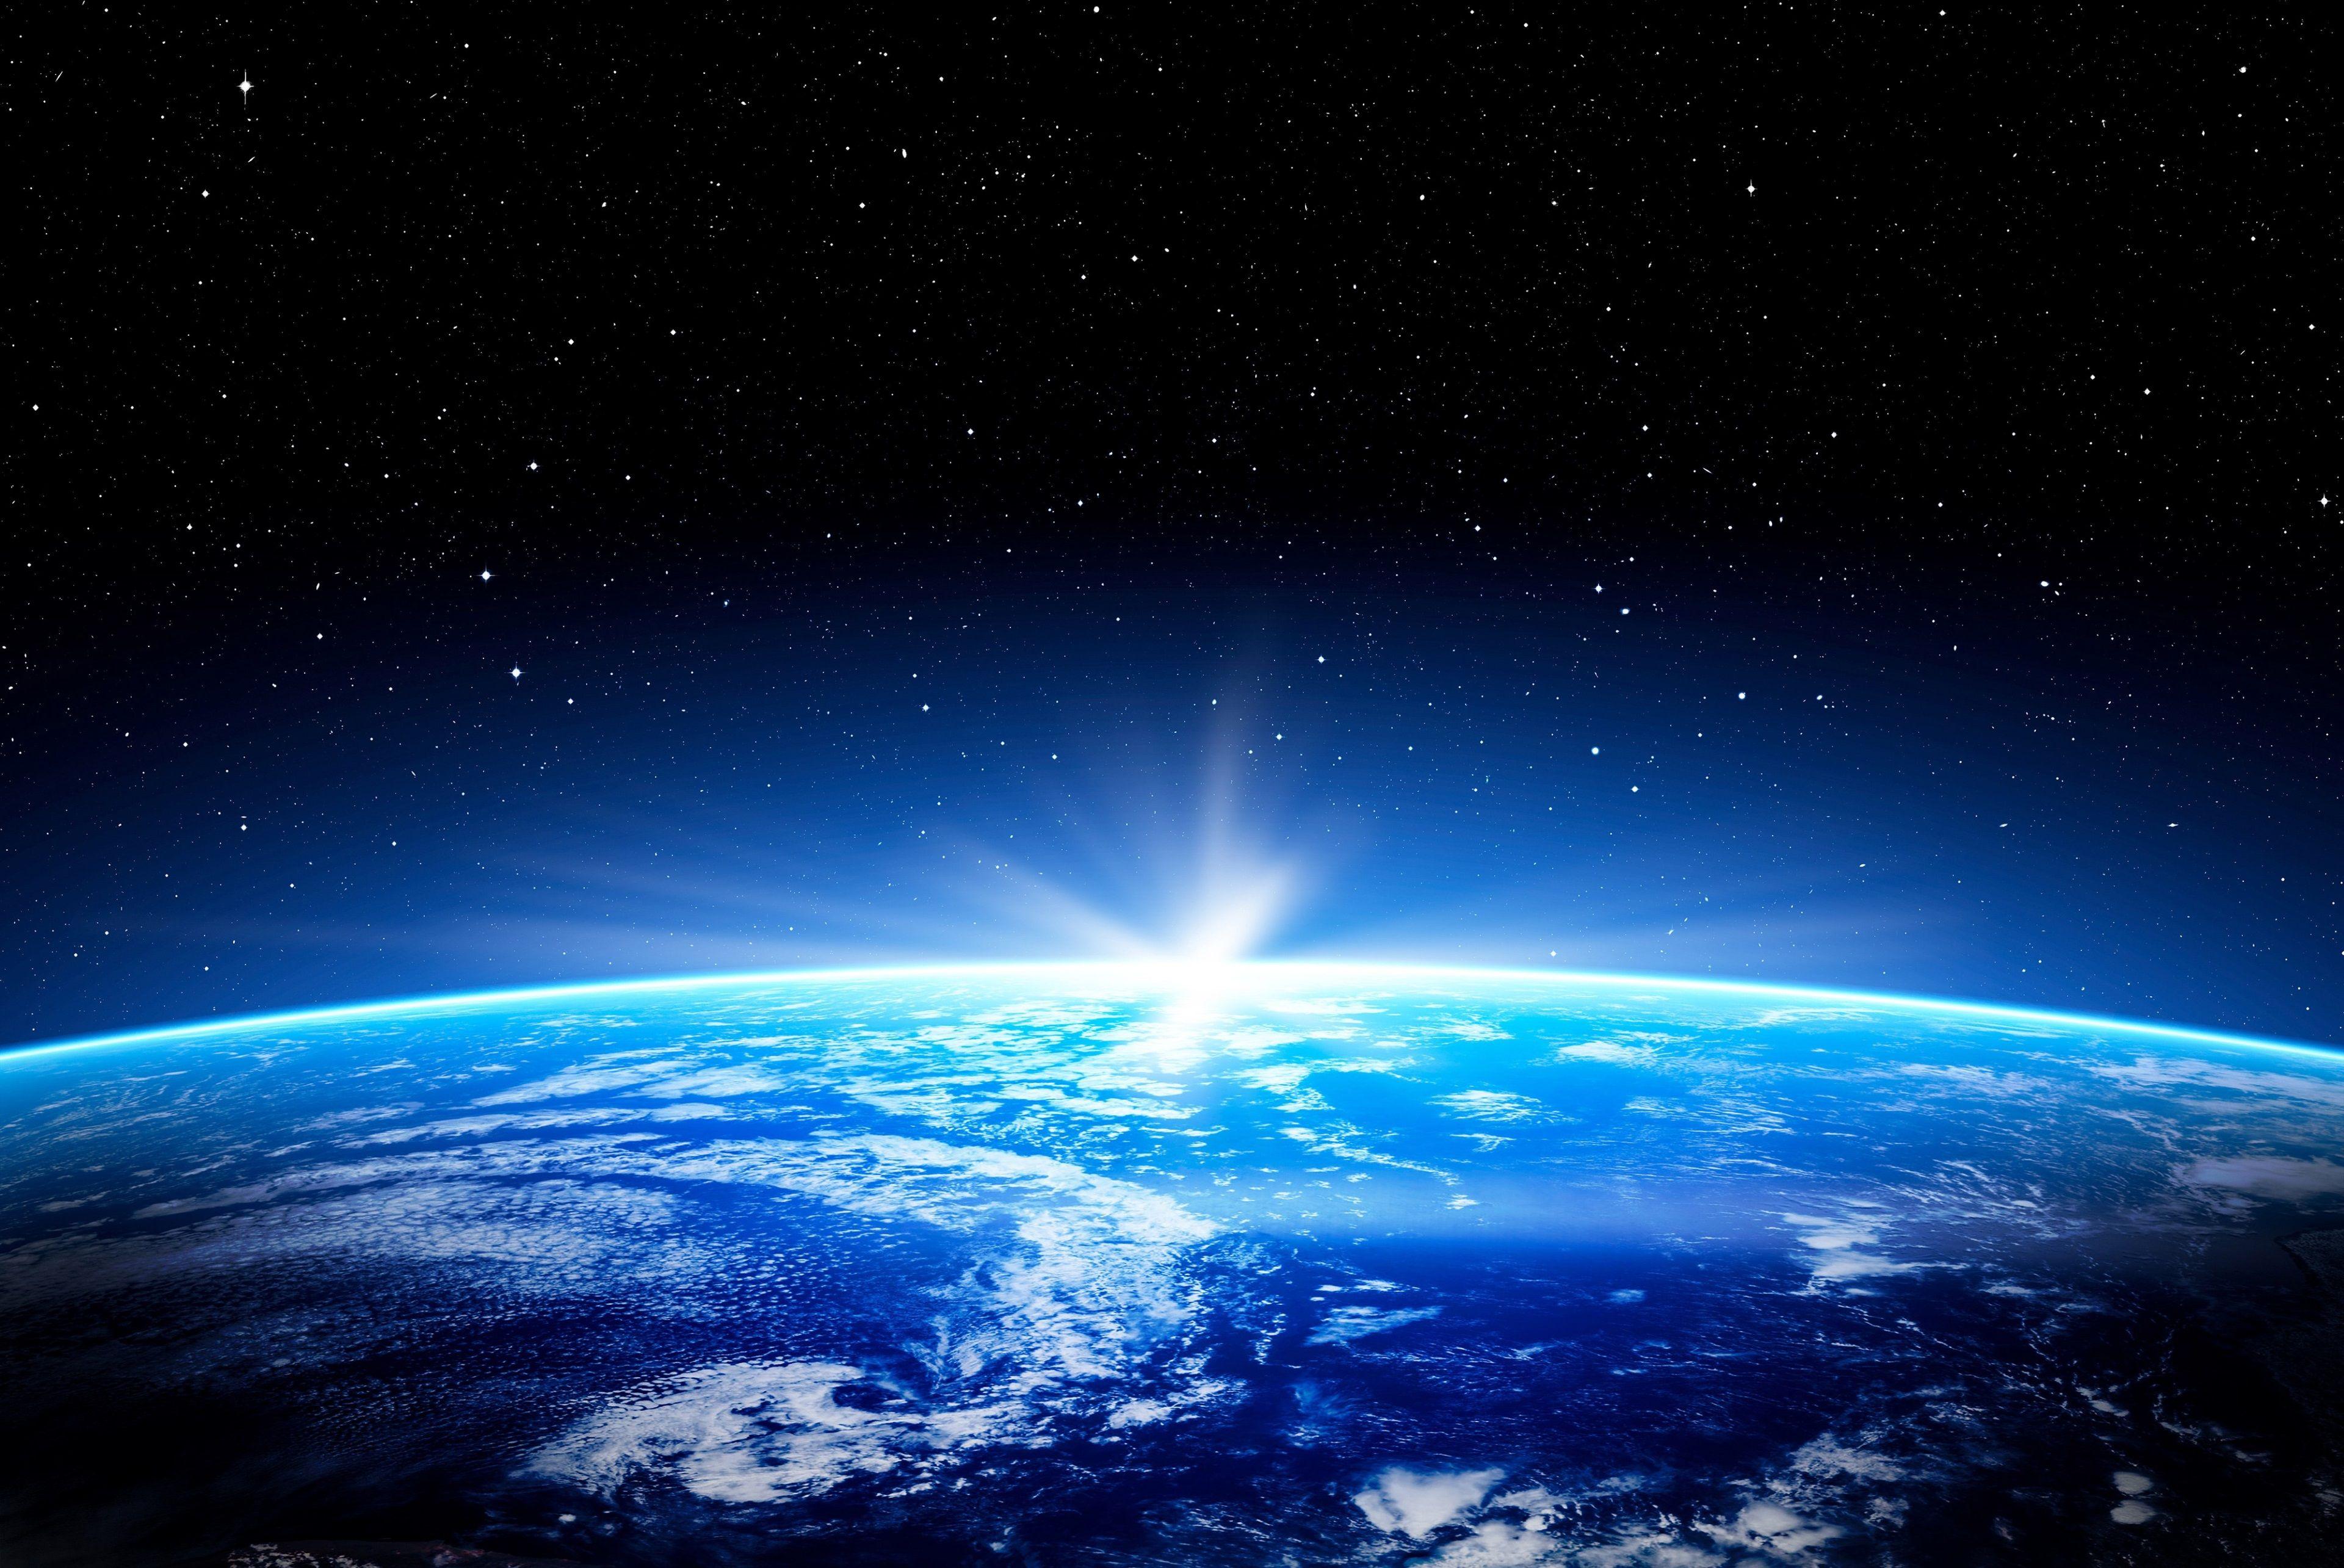 3840x2569 Earth 4k Hd Wallpaper 1080p Wallpaper Earth Earth Photos Earth Illustration